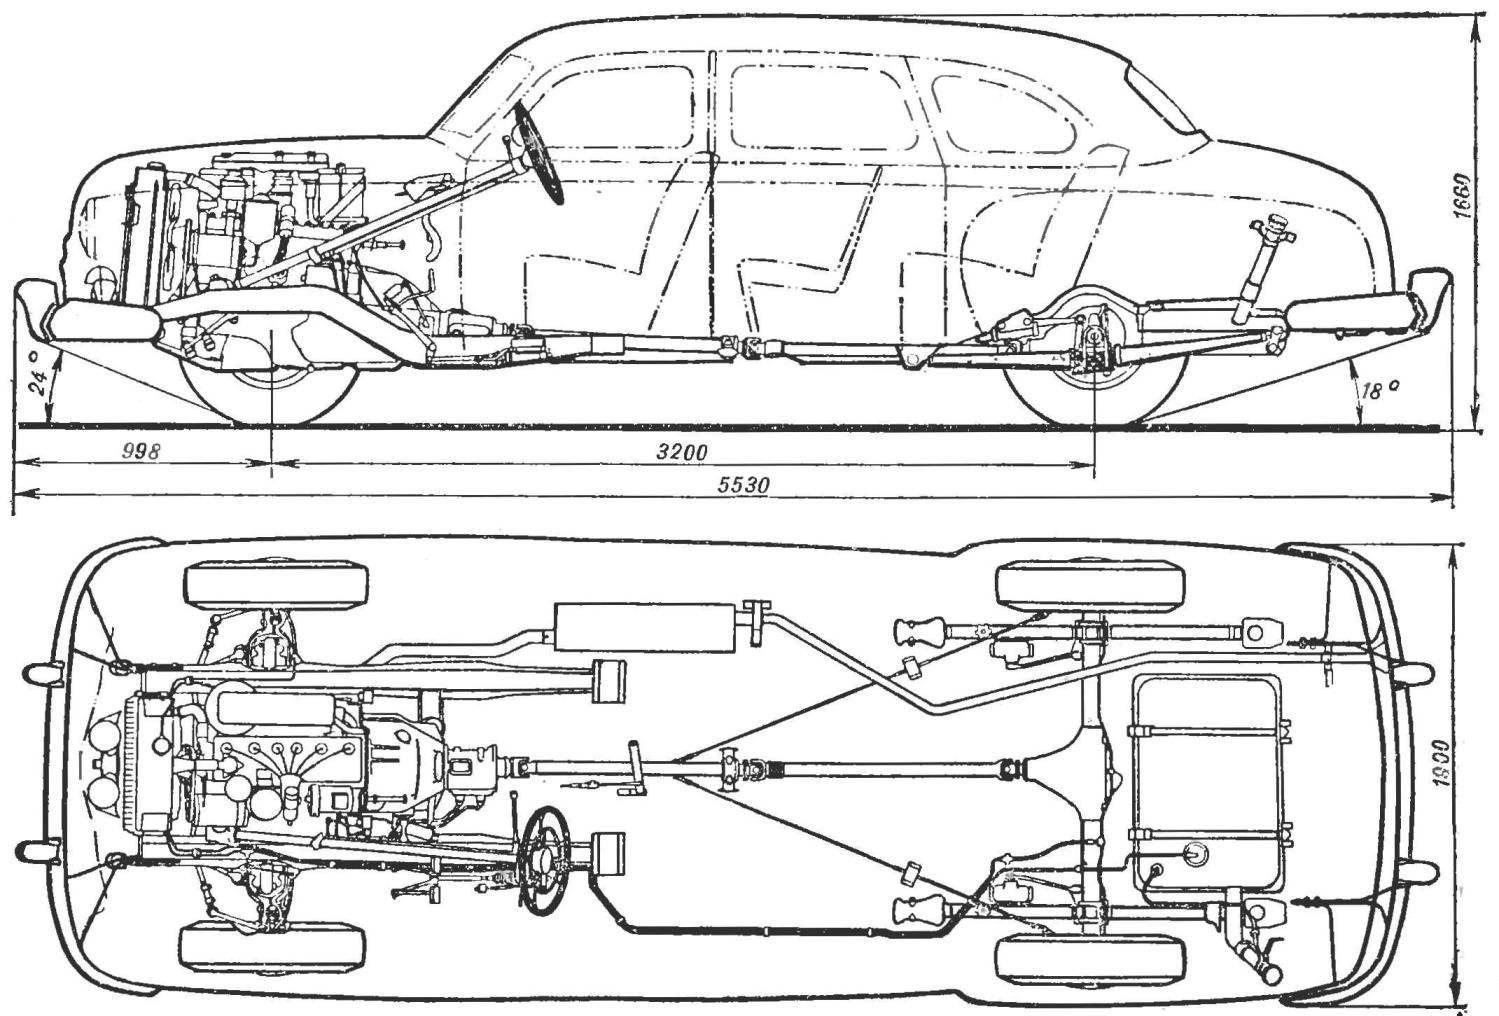 Рис. 1. Автомобиль ГАЗ-12.